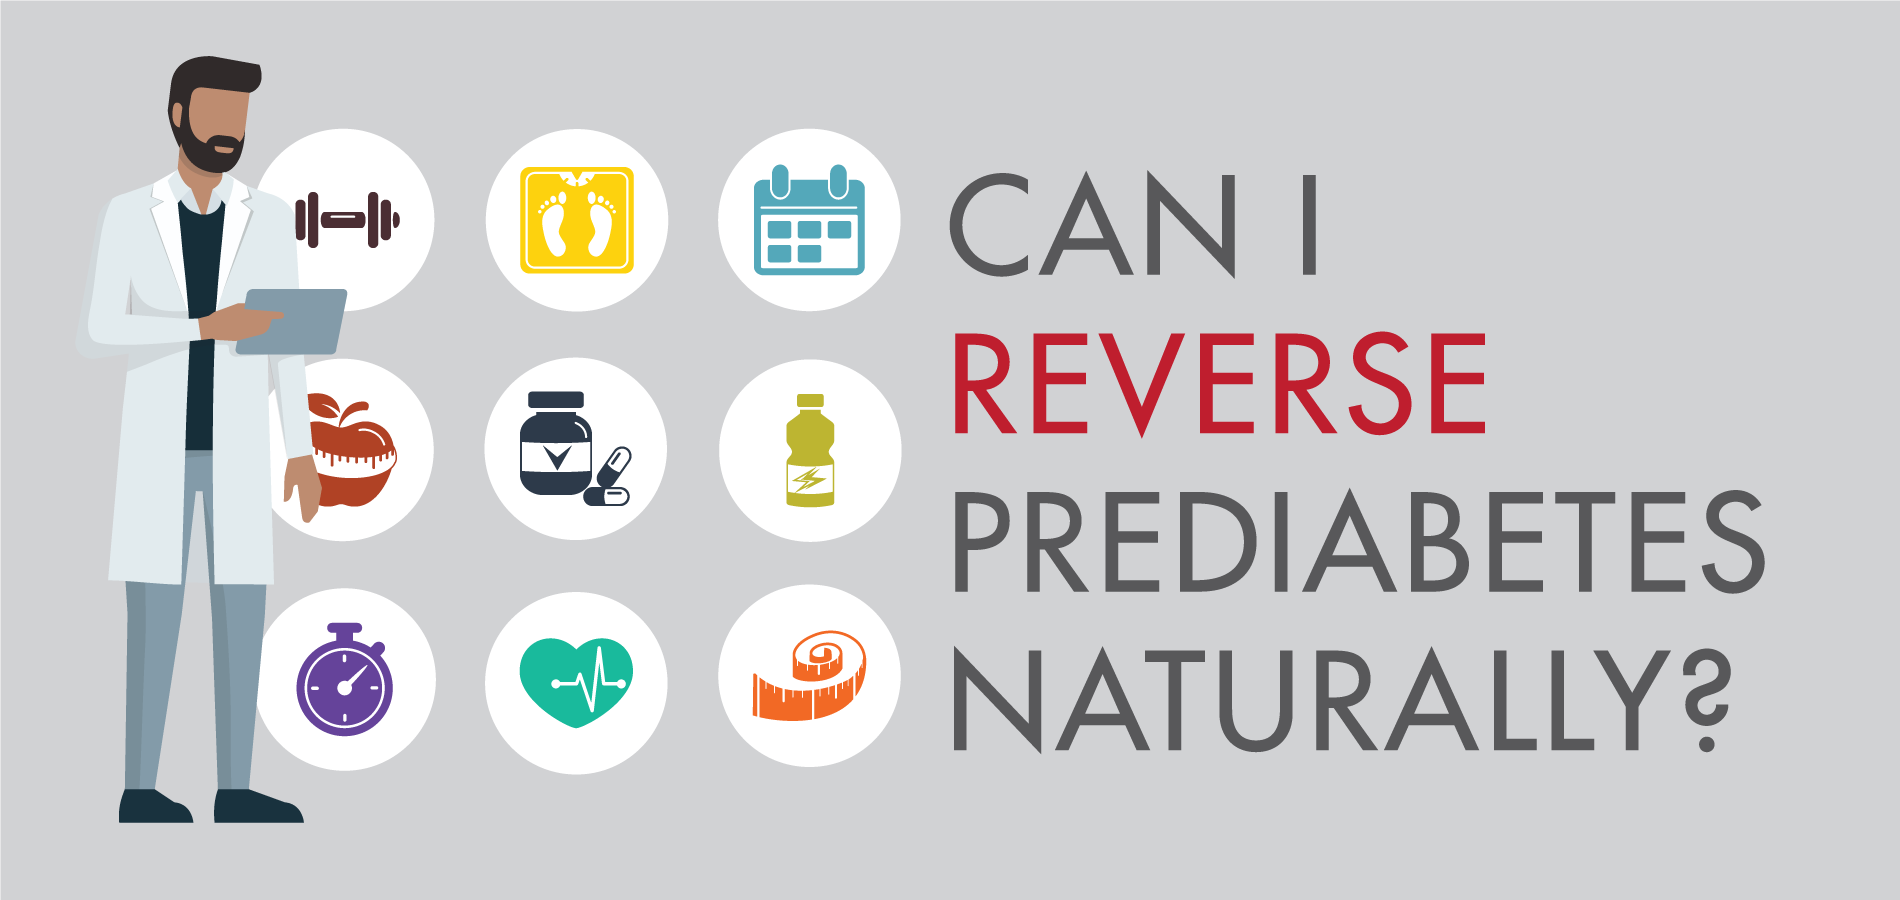 Can I Reverse Prediabetes Naturally